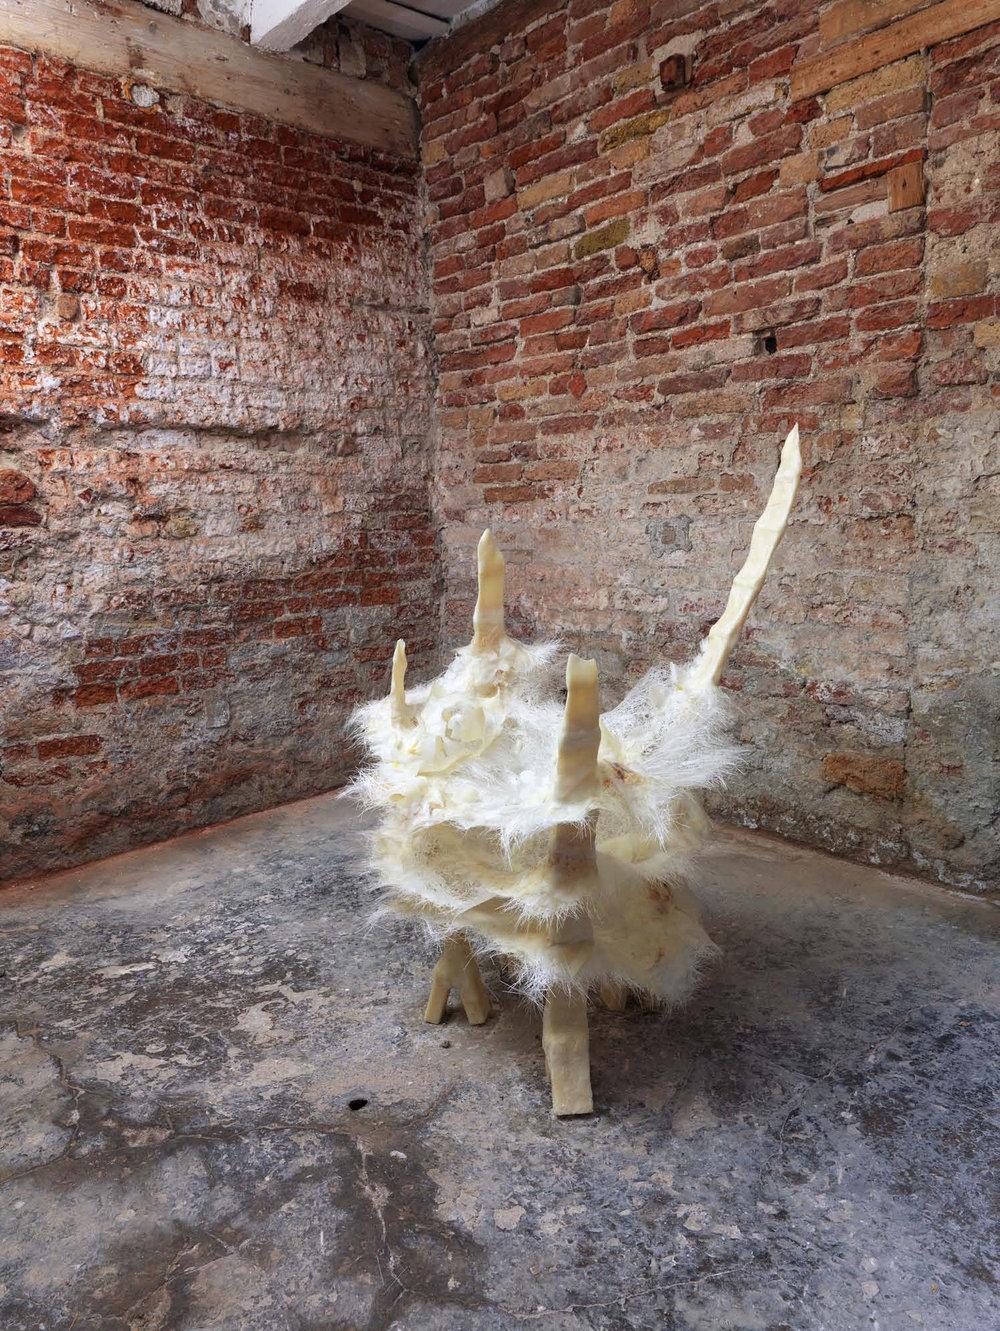 Untitled, 2011 - mixed media, 120 x 87 x 65 cm, installation view at DNA project box, Venice   photo: Alessandro Zambianchi